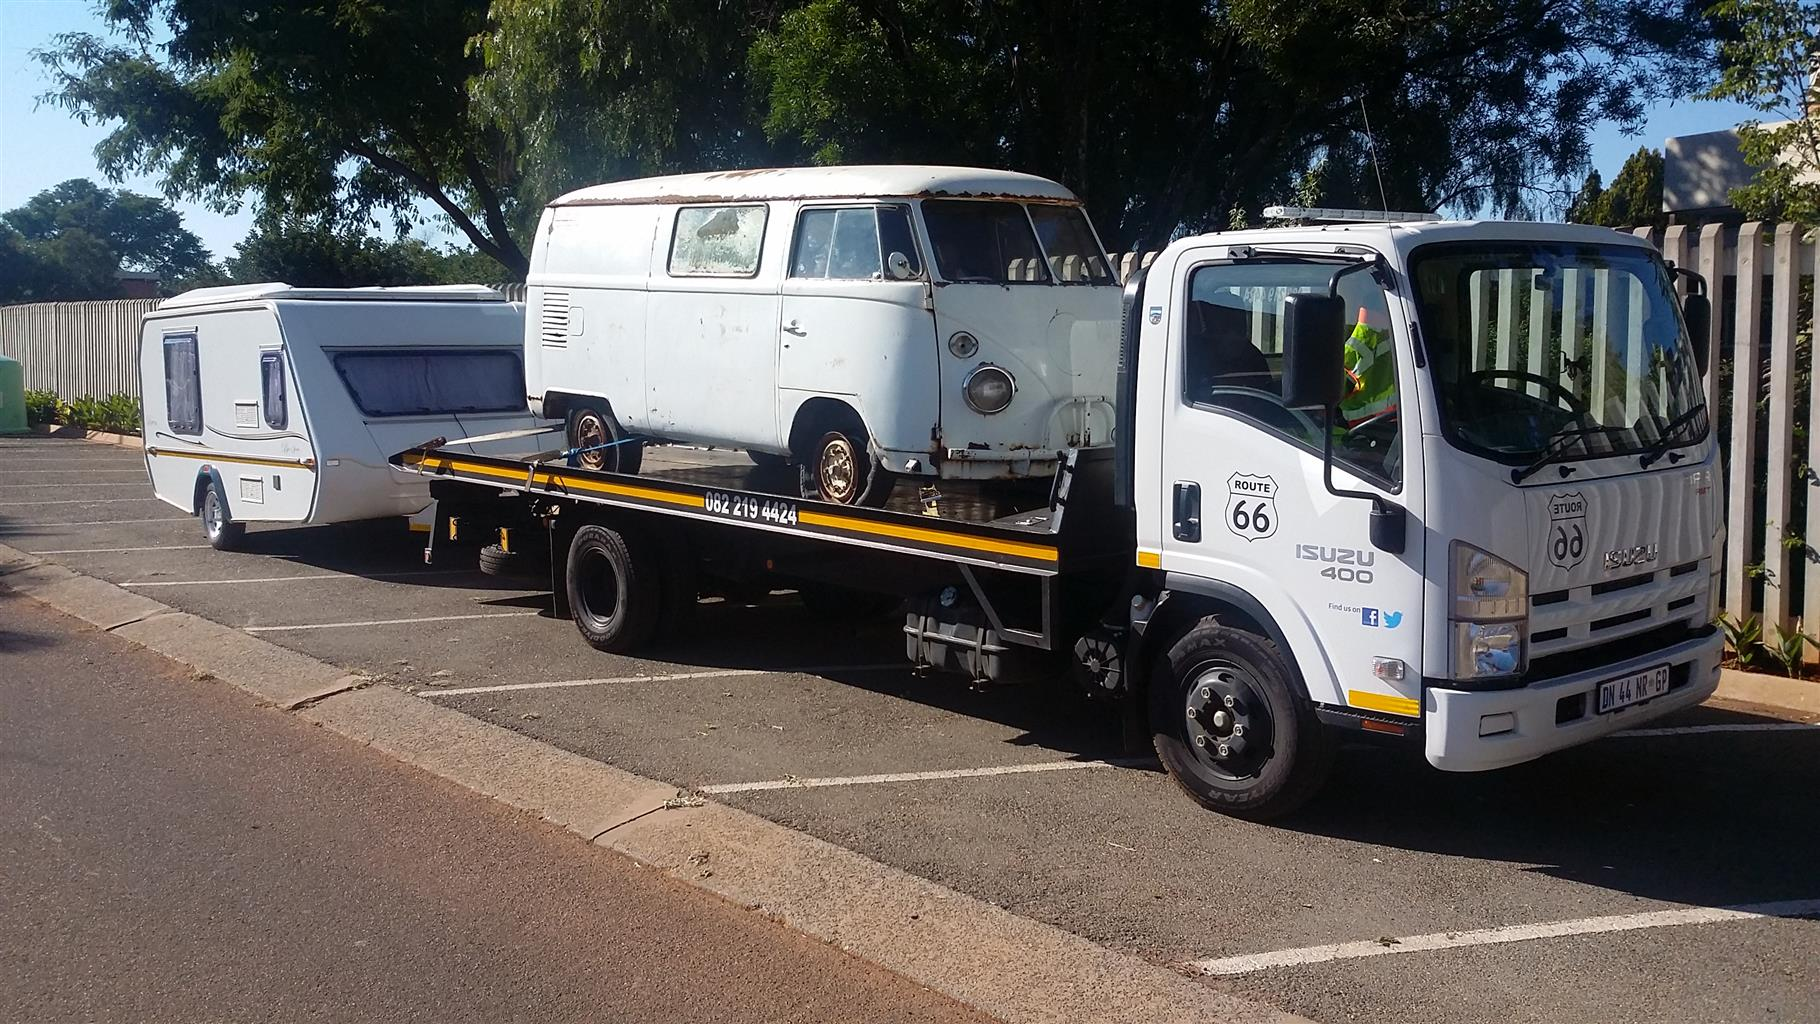 George, Bloemfontein to Gauteng. Trailer & Caravan Transport. Jurgens, Horsebox, Echo 4x4 and Boats.